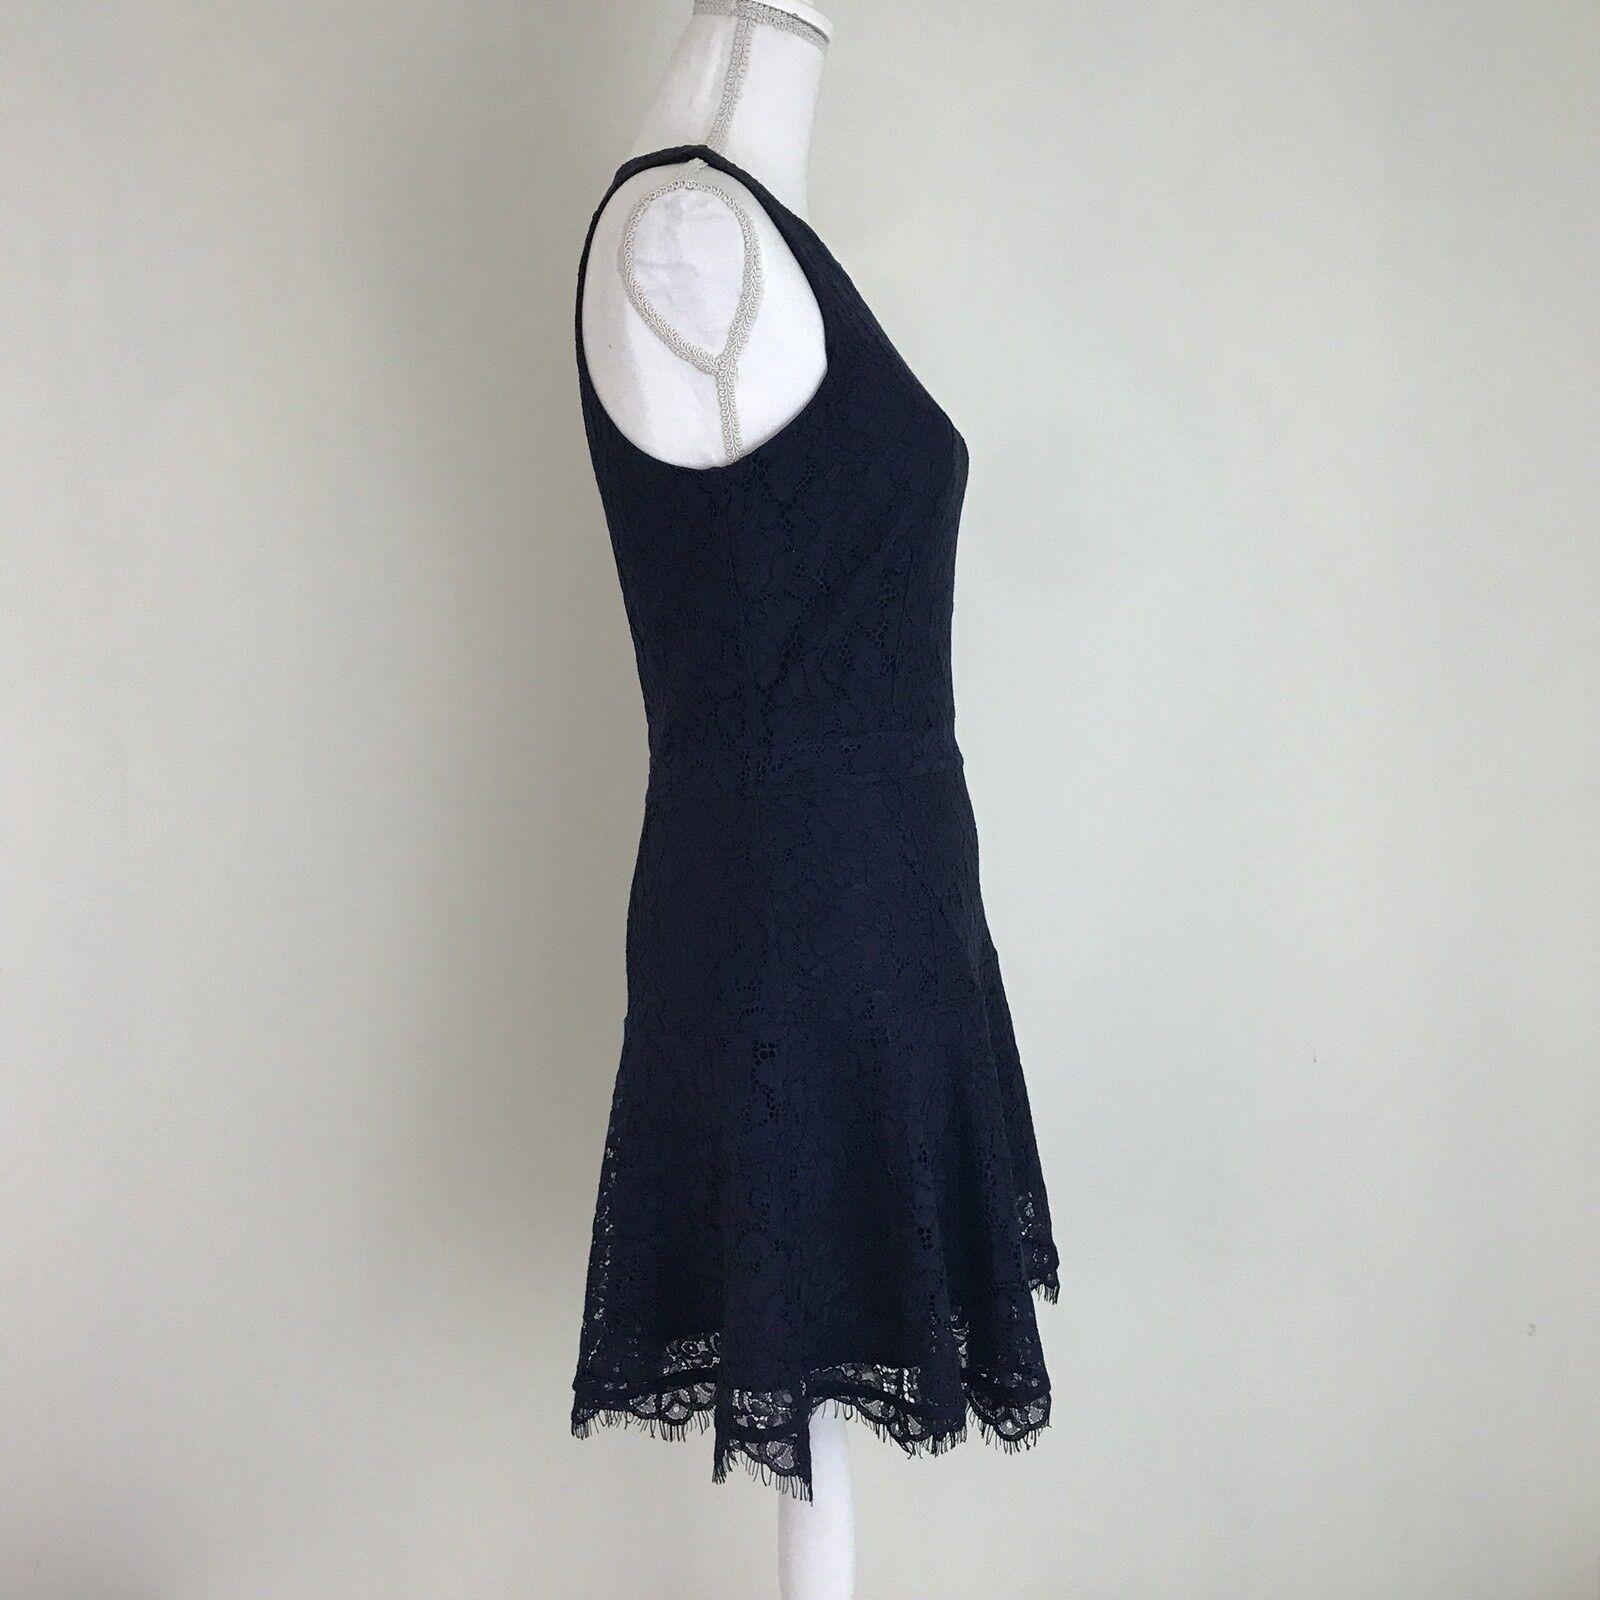 NEW JOIE WOMENS ADISA LACE DRESS DRESS DRESS Size 6 Navy bluee 8f8d5a